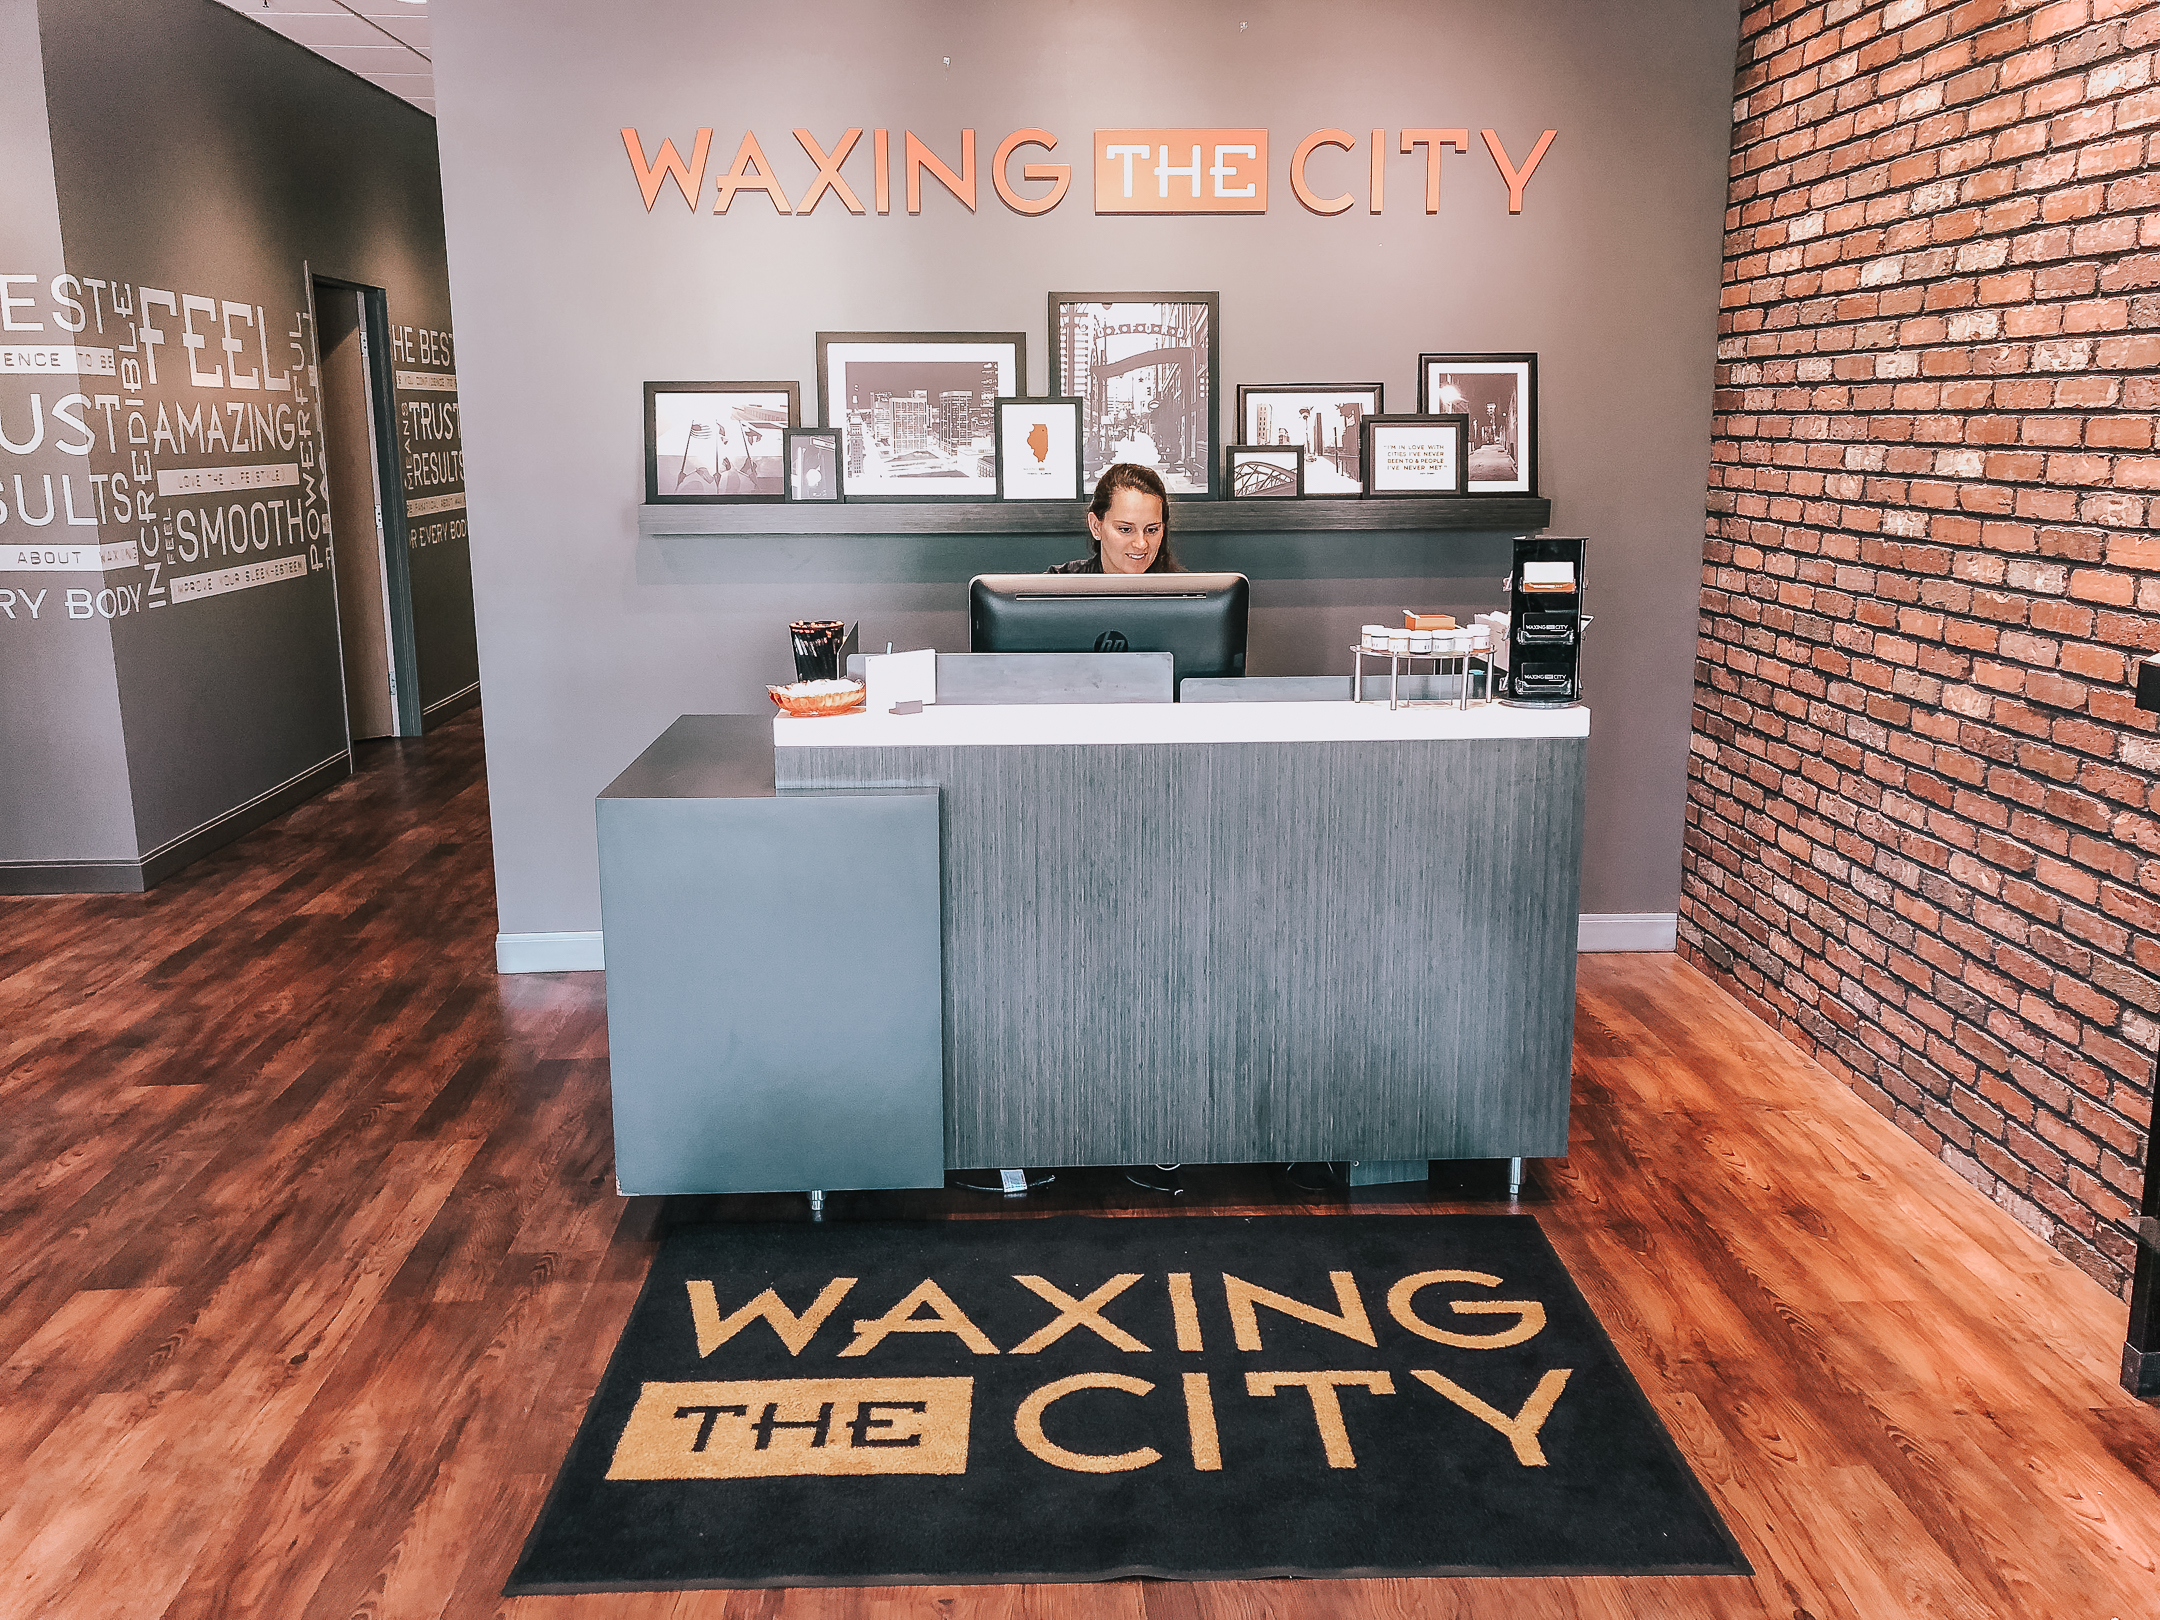 personal summer prep with waxing the city, bikini wax, self care